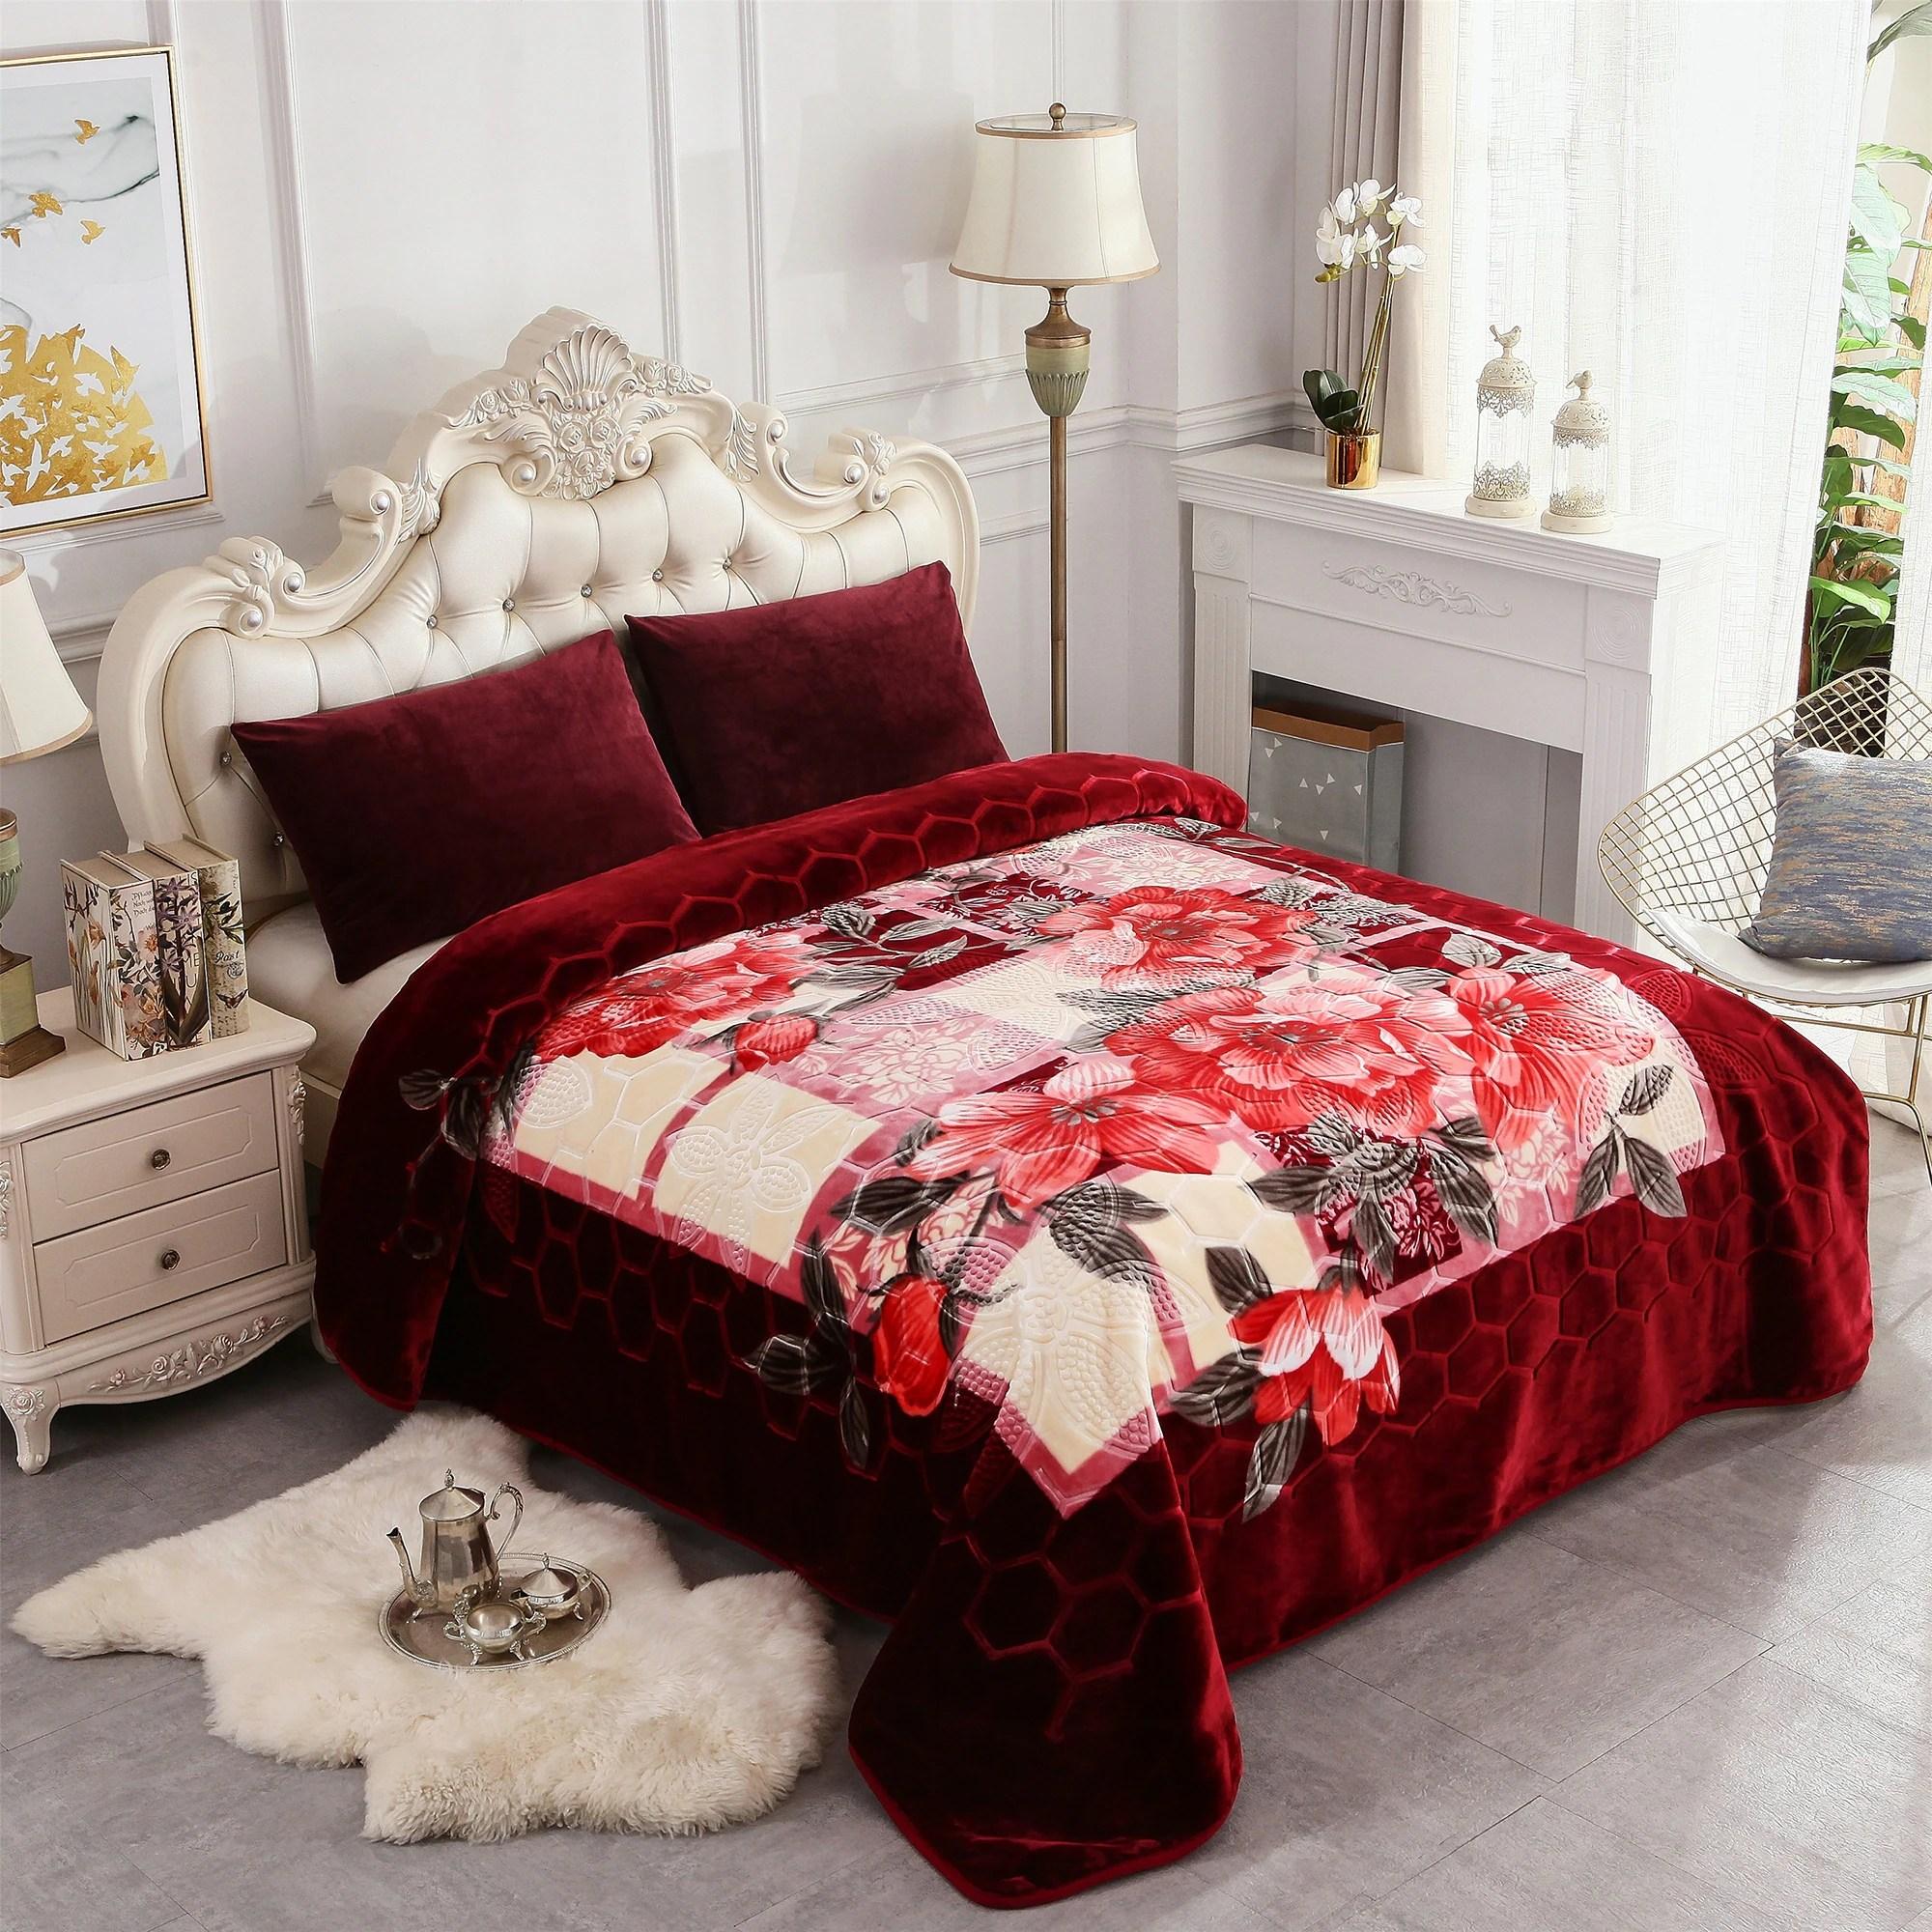 heavy korean mink blanket fleece blanket king size 85 x 95